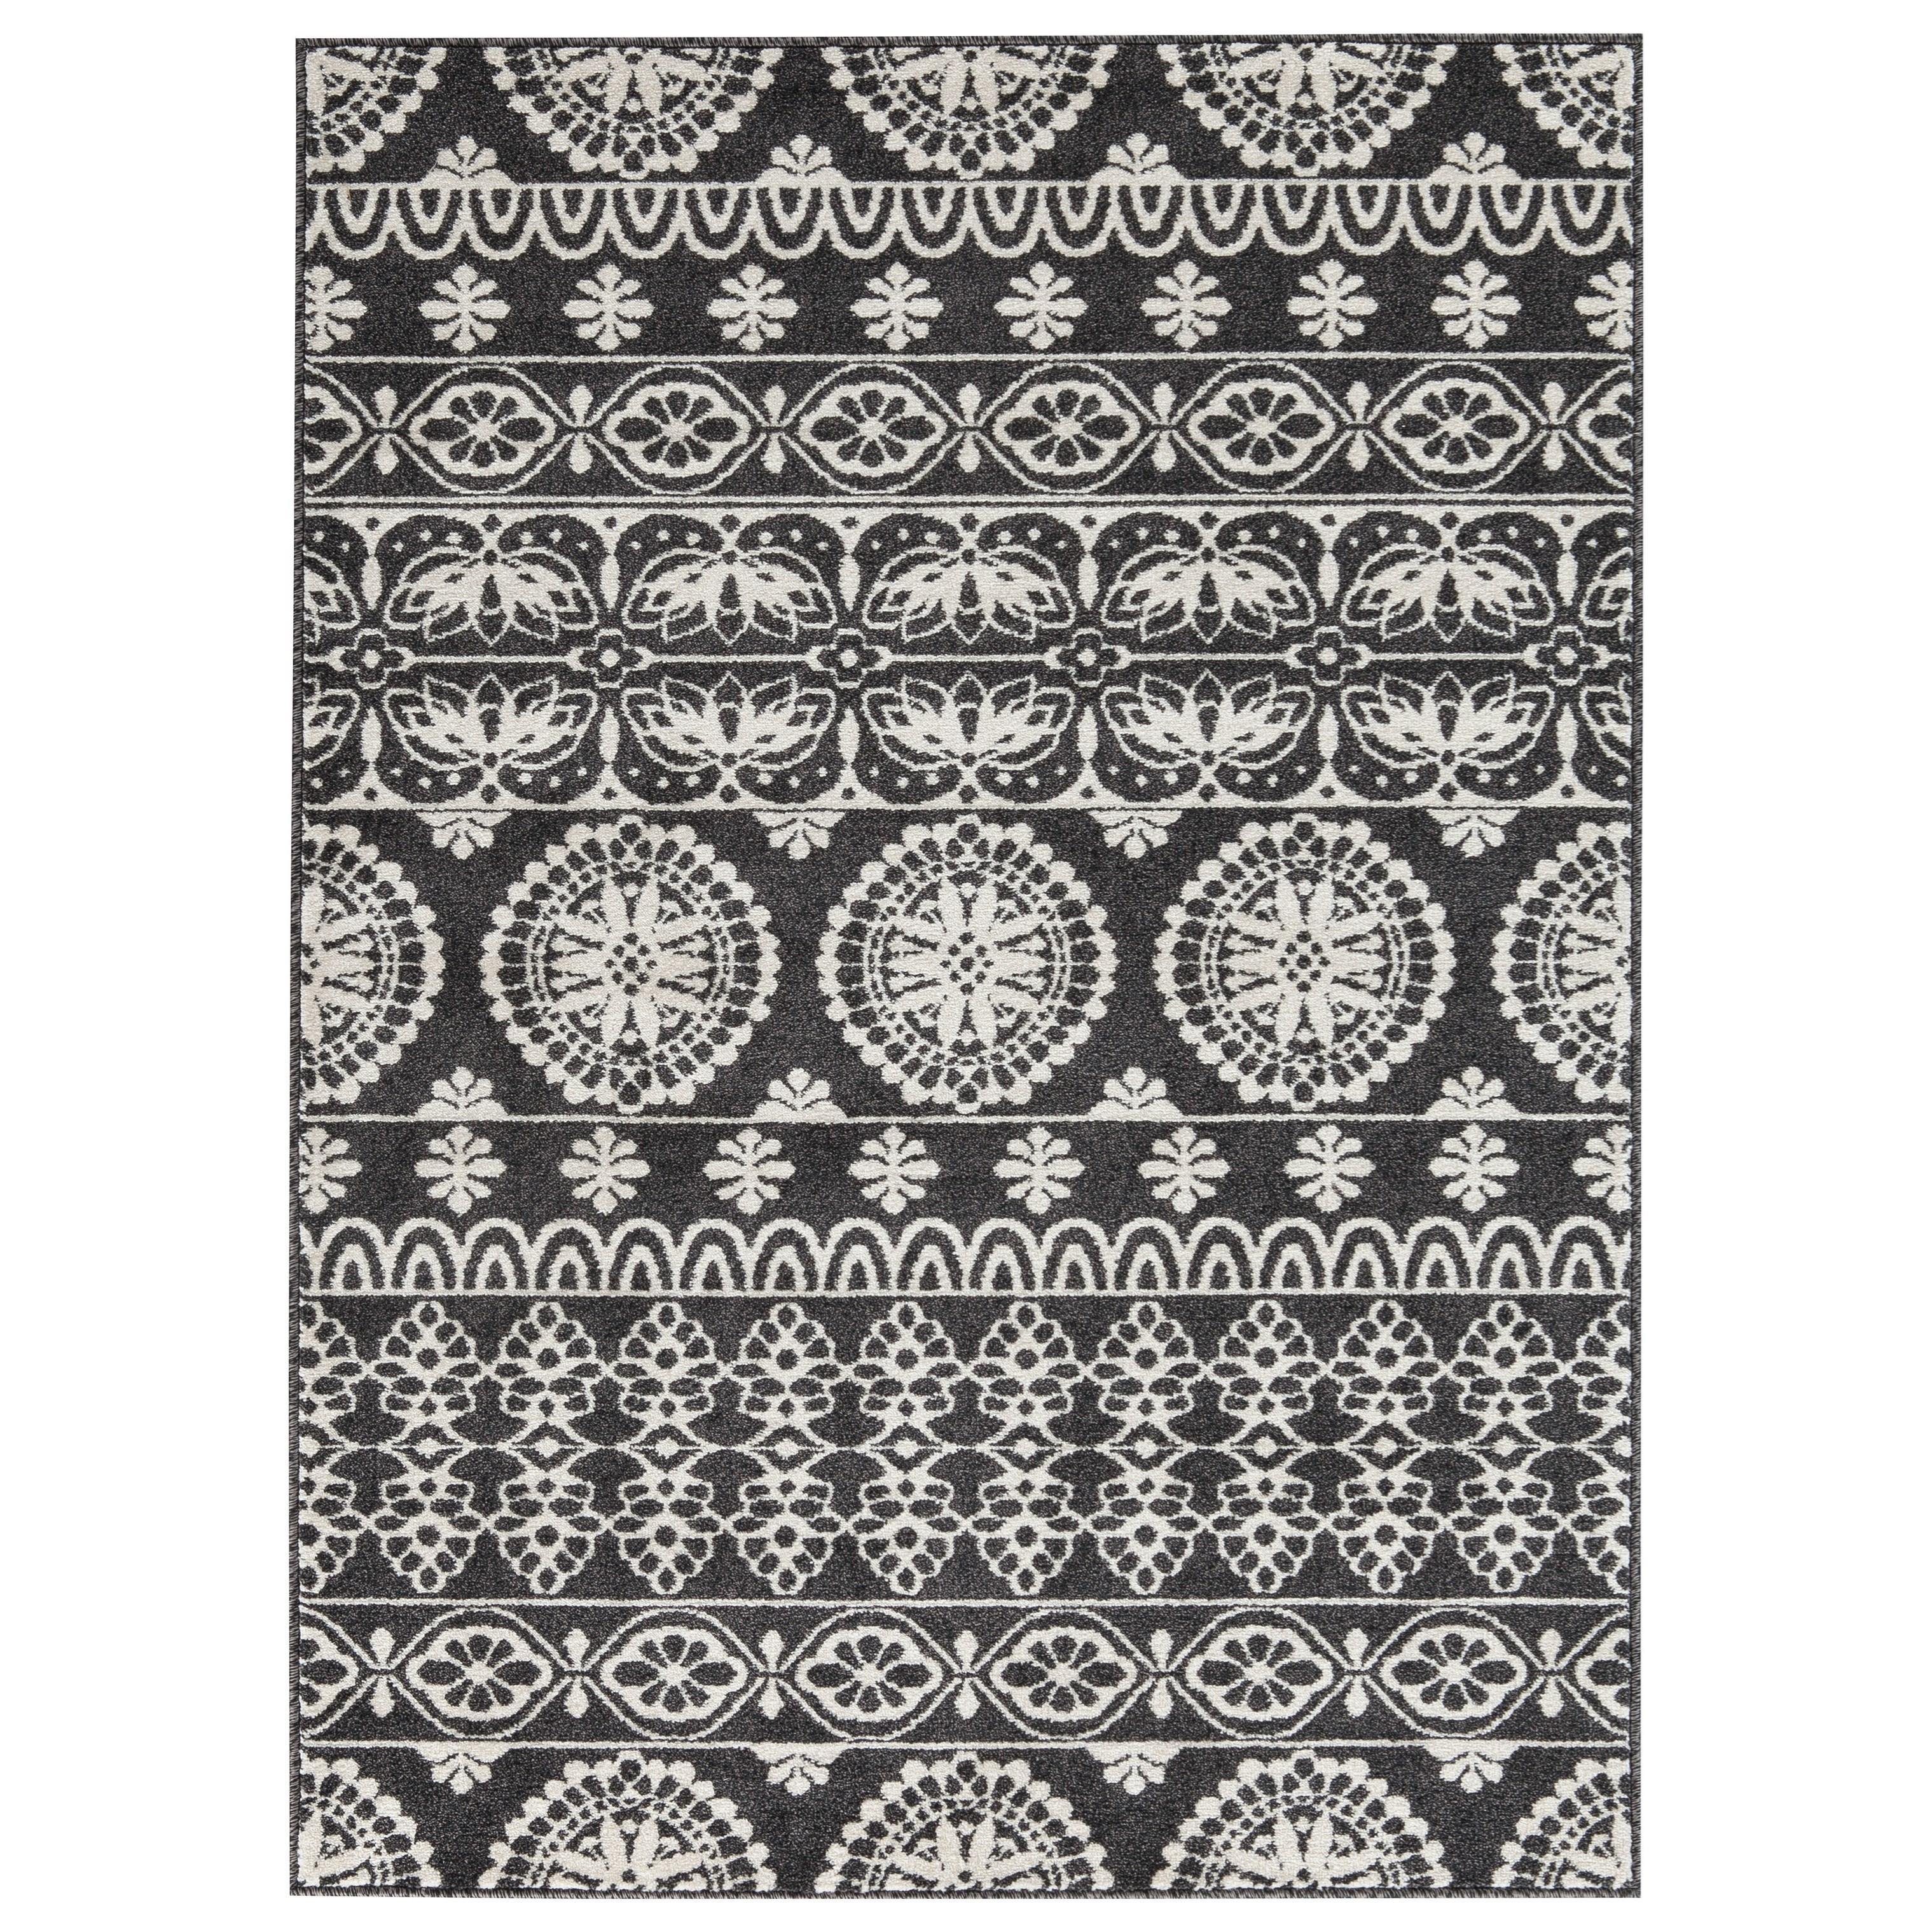 Transitional Area Rugs Jicarilla Black/White Medium Rug by Signature Design by Ashley at Furniture Barn